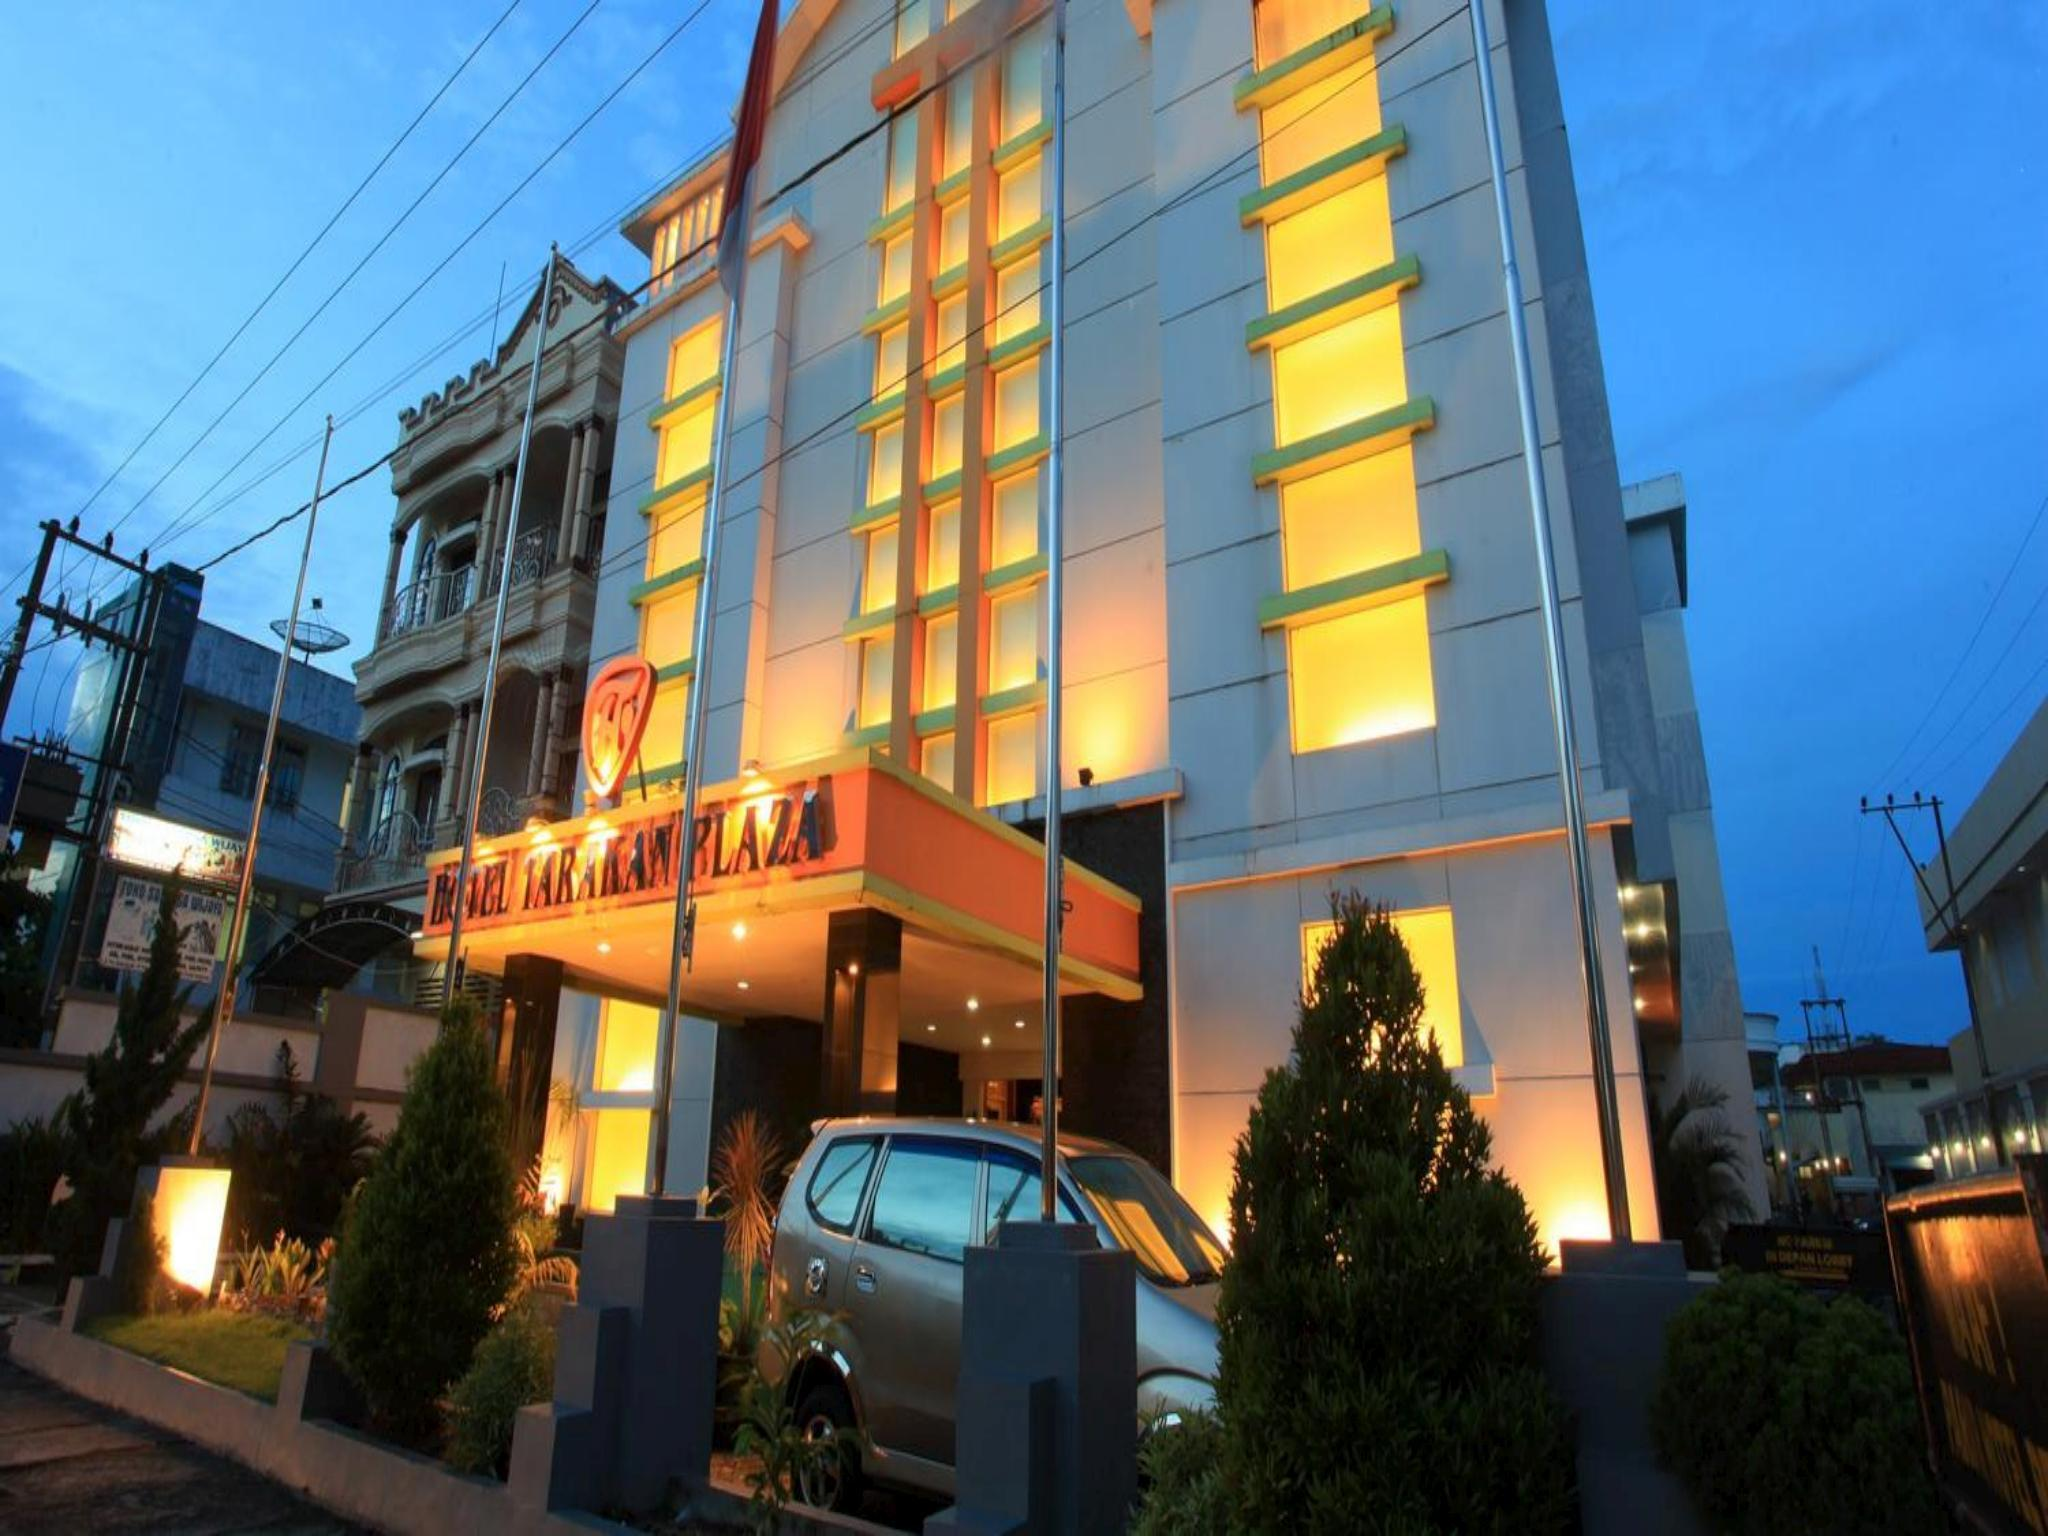 Hotel Tarakan Plaza